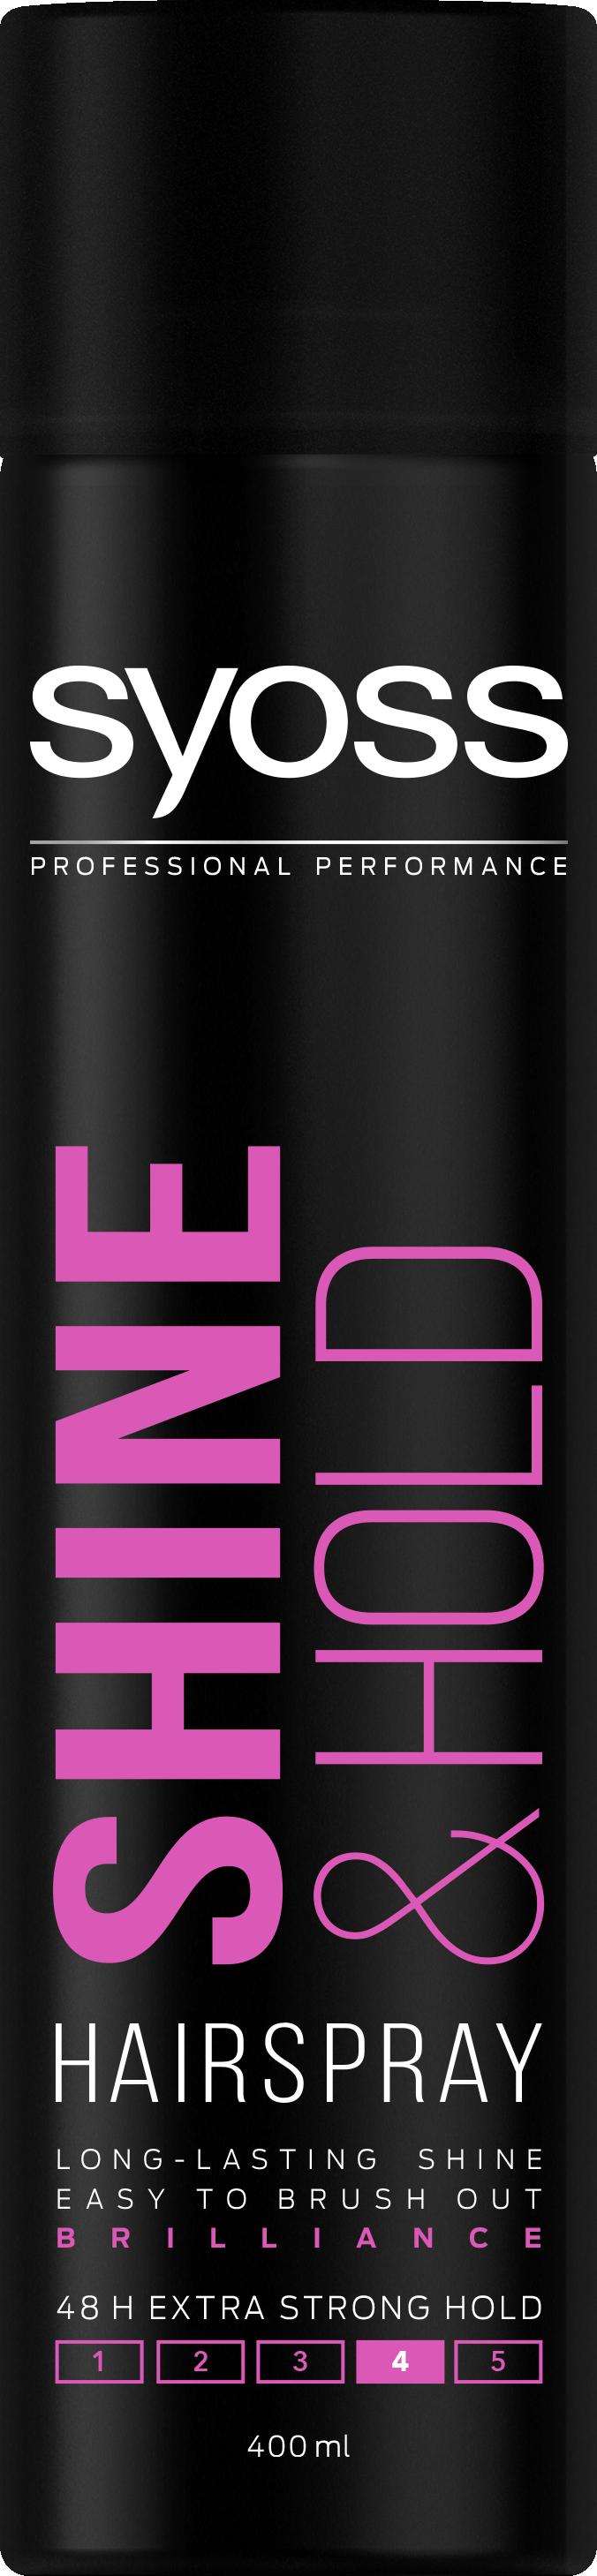 Syoss Shine & Hold Hairspray